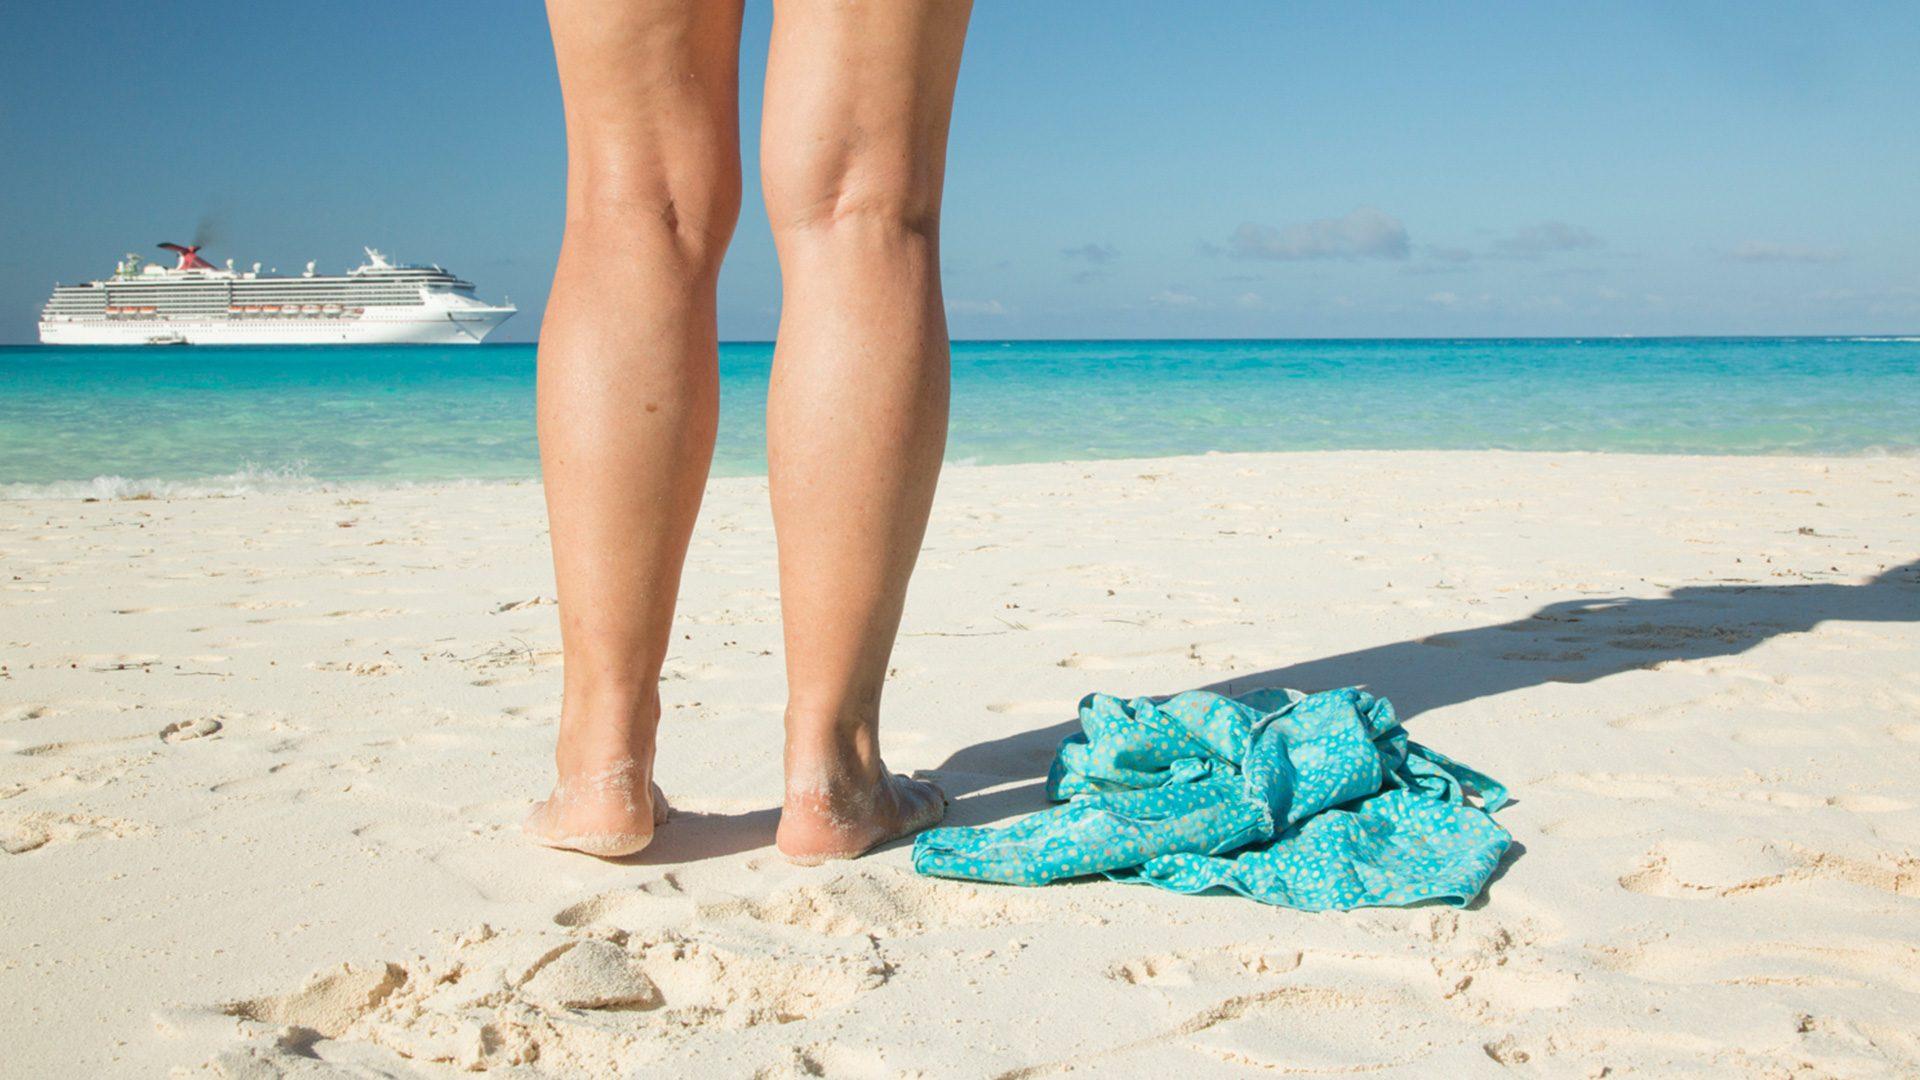 Big Nude Boat 2019 Best Bare Beaches Bare Necessities